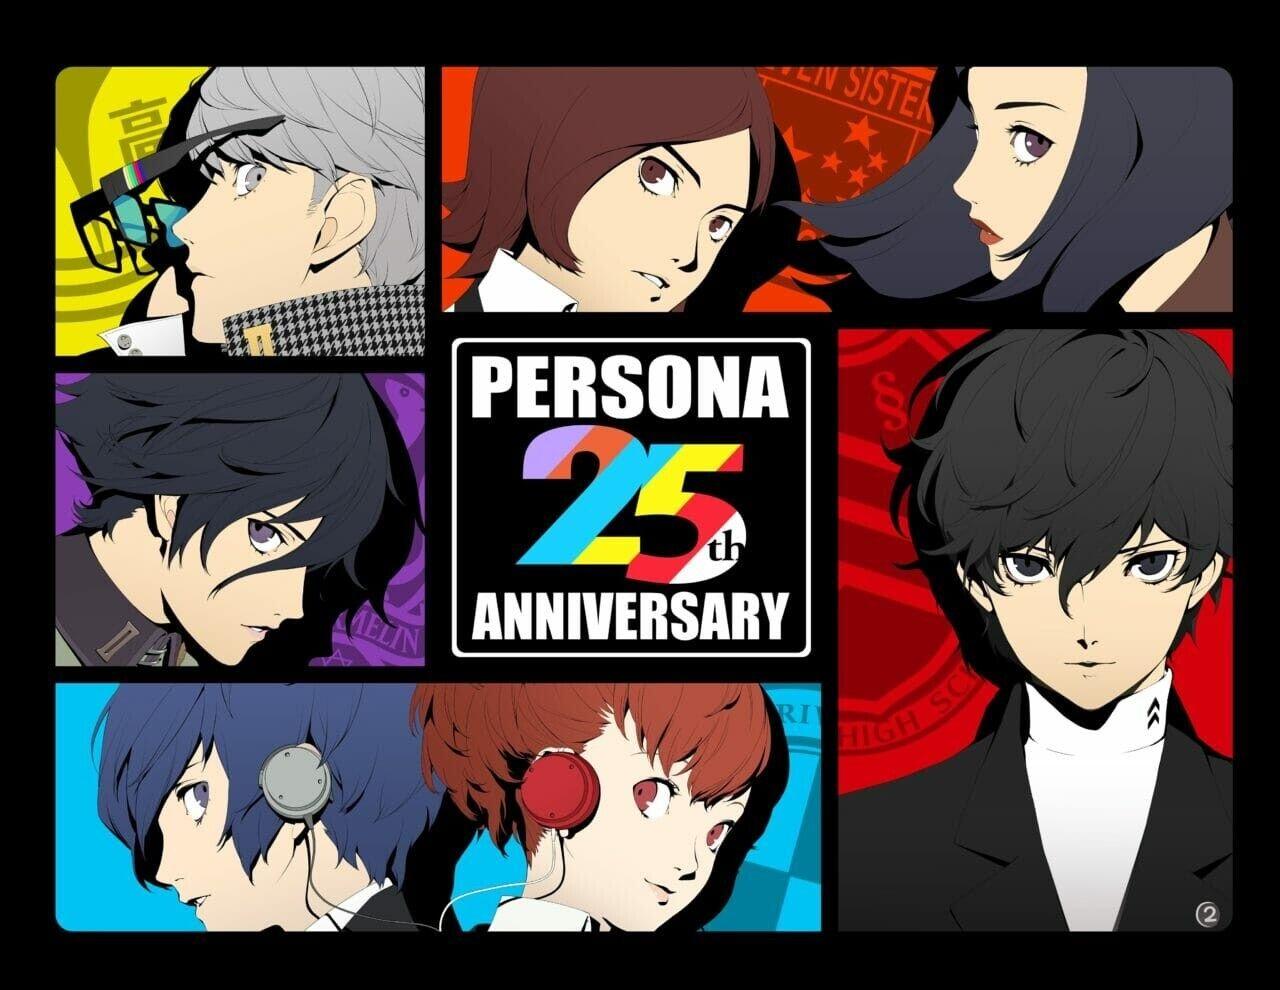 Persona 25 anniversary